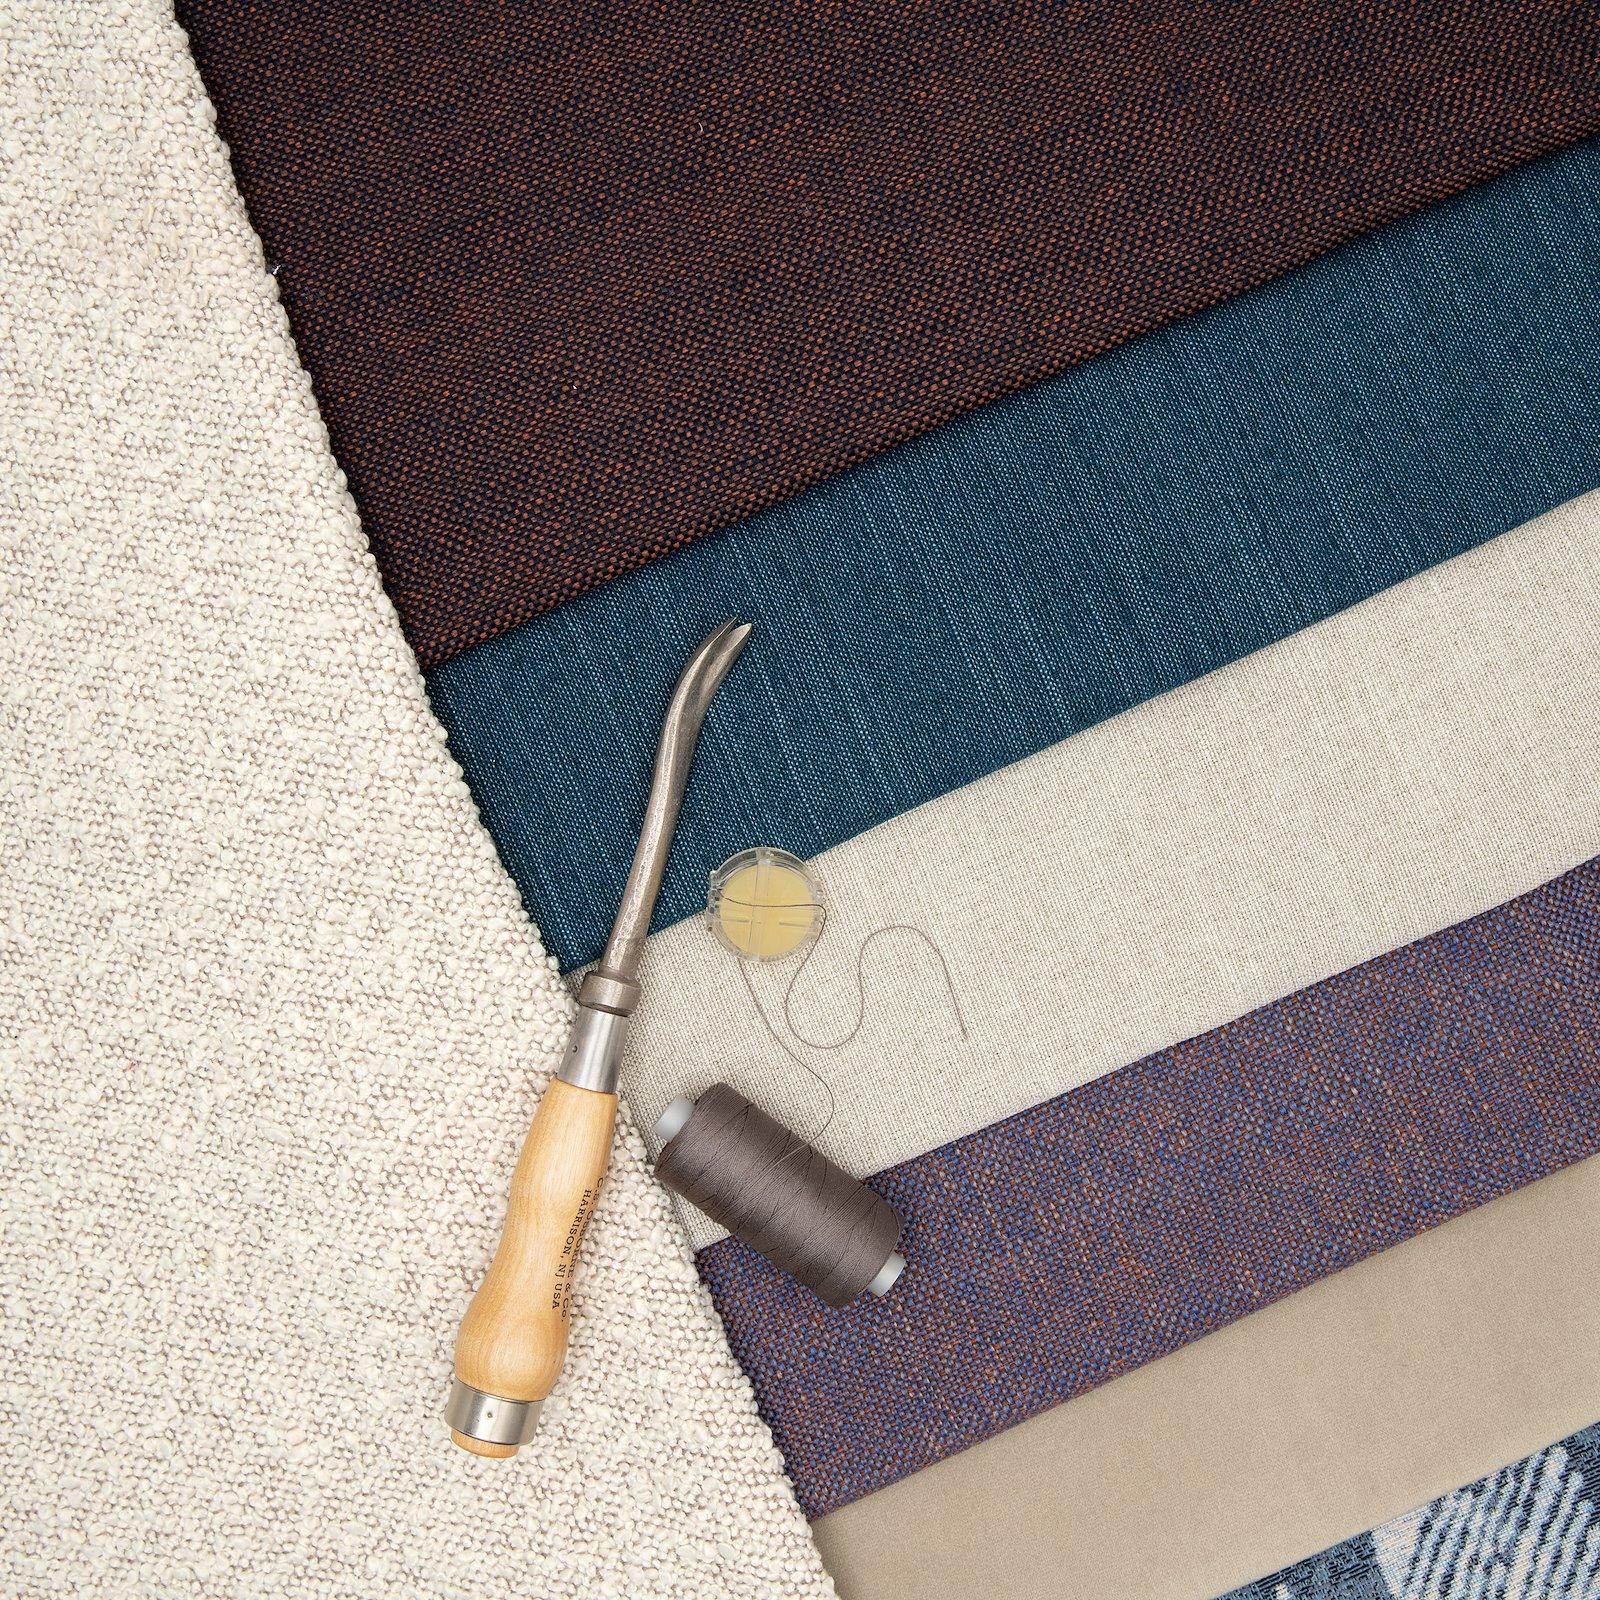 Upholstery fabric cobalt blue/caramel 824161_824157_824153_824152_824156_824158_bundle